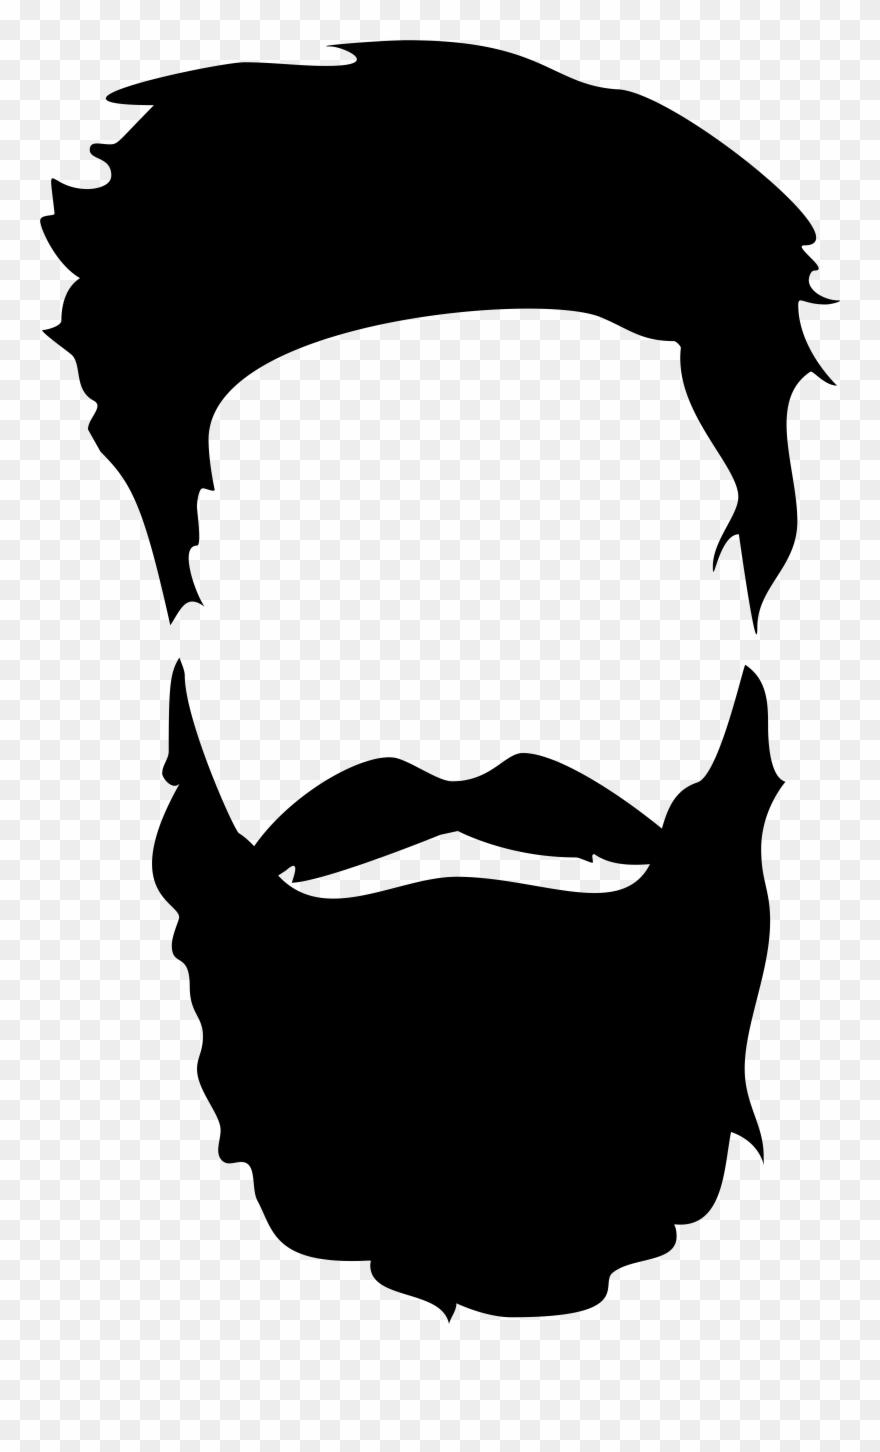 Beard clipart facial hair. Png clip art gallery